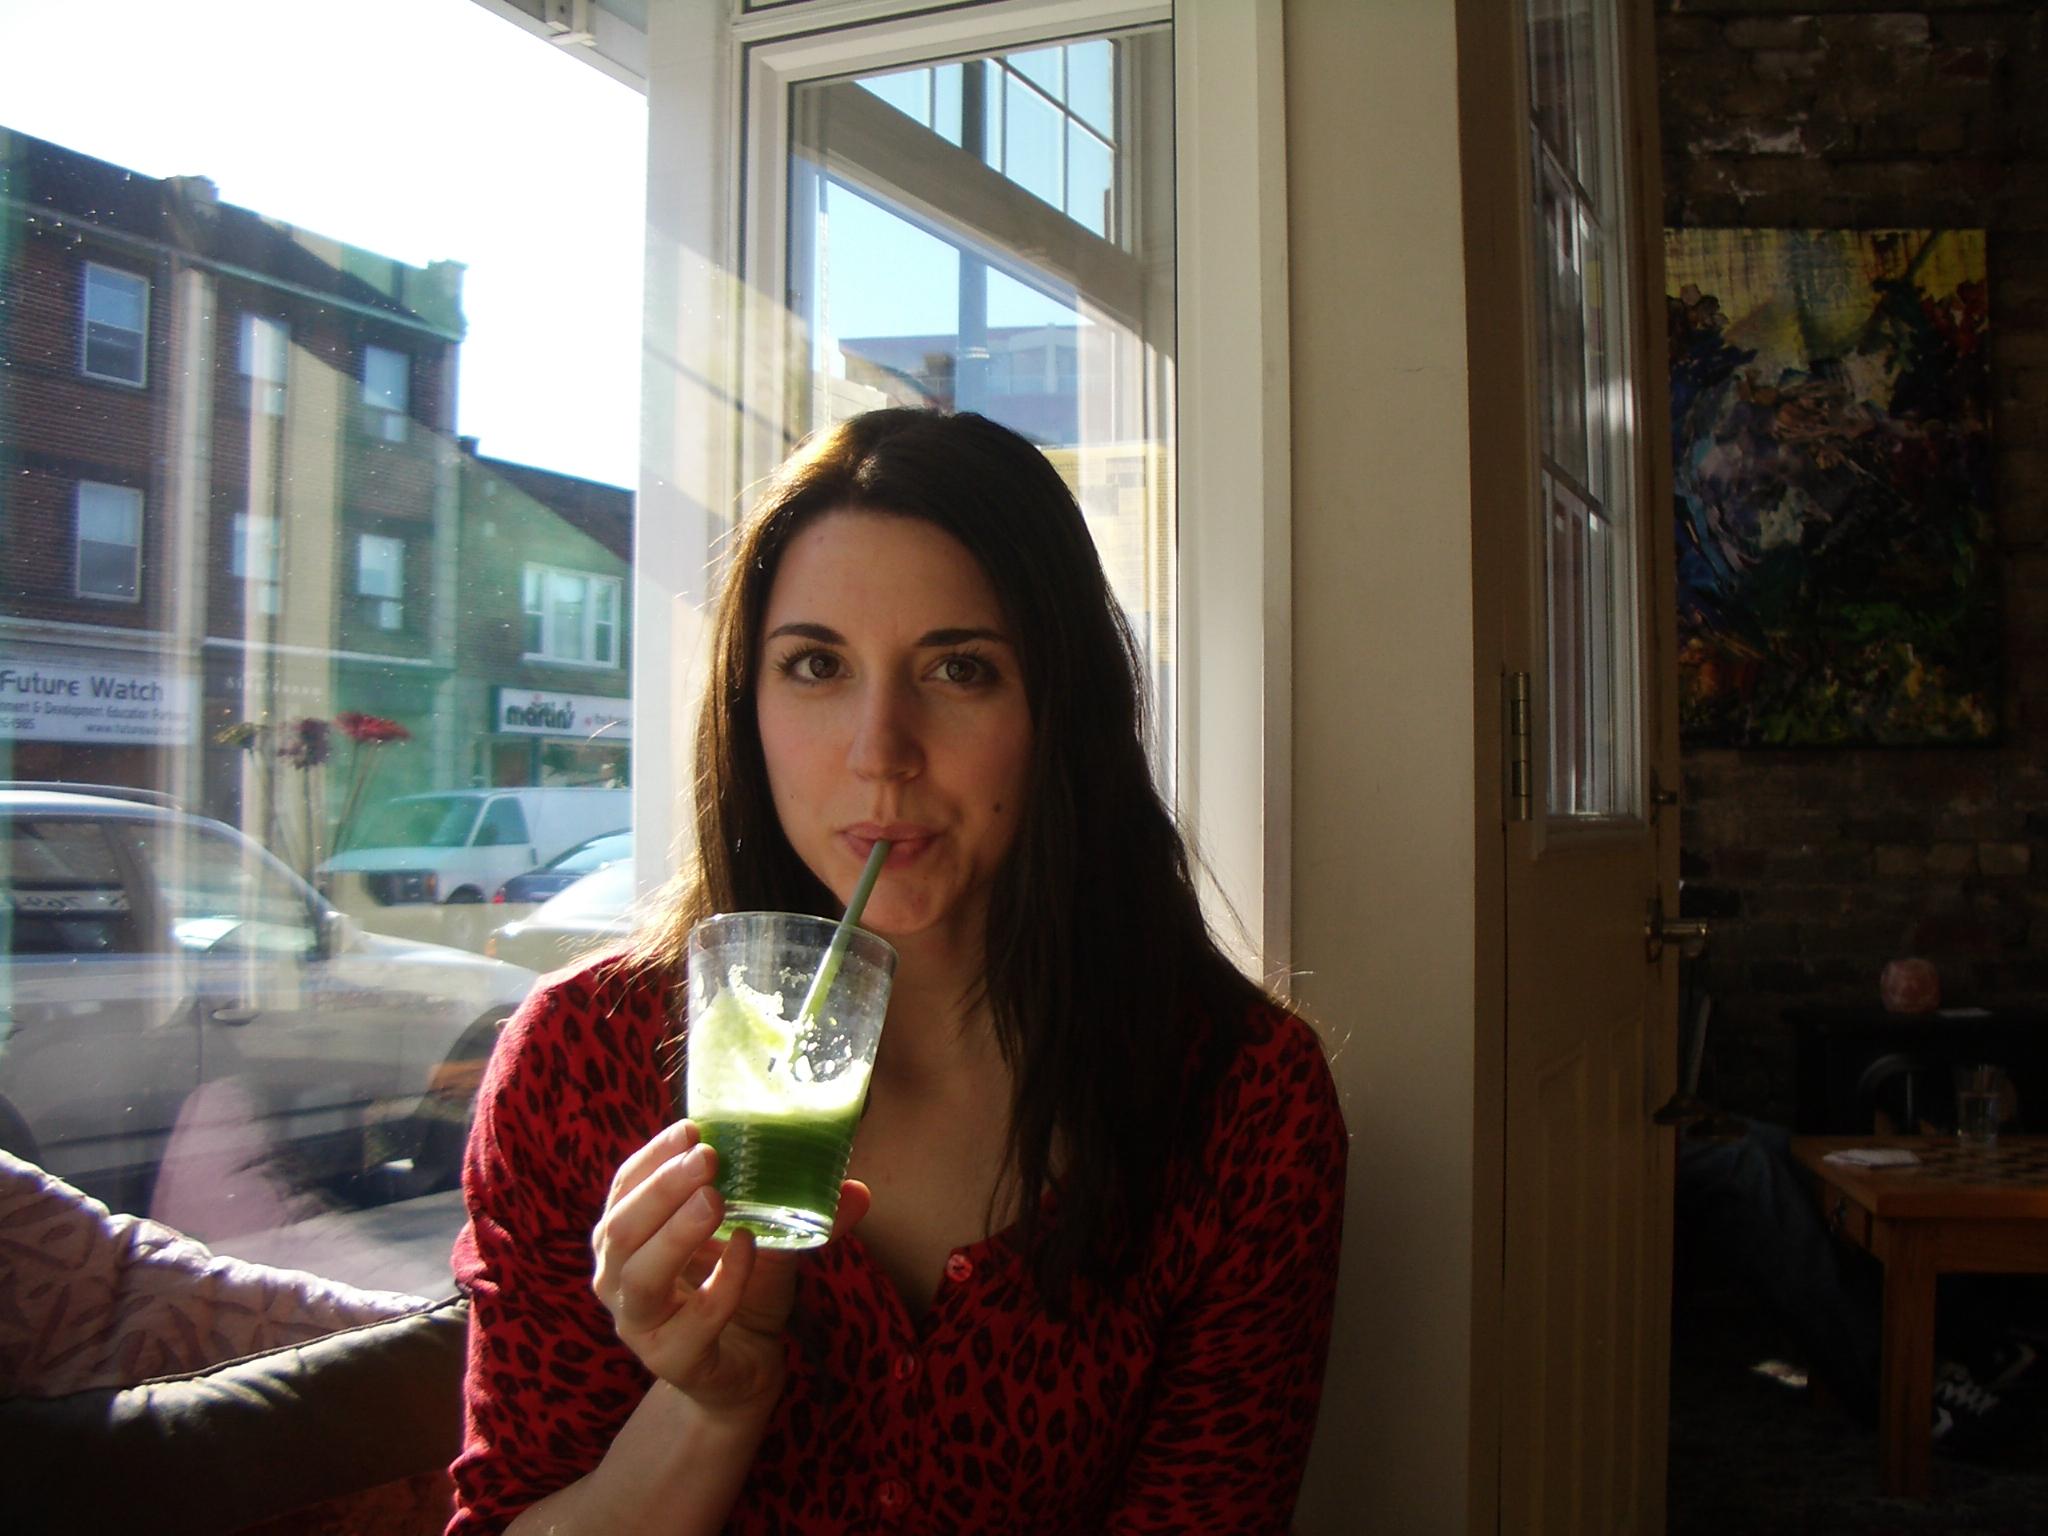 Me drinking my Lean Green juice